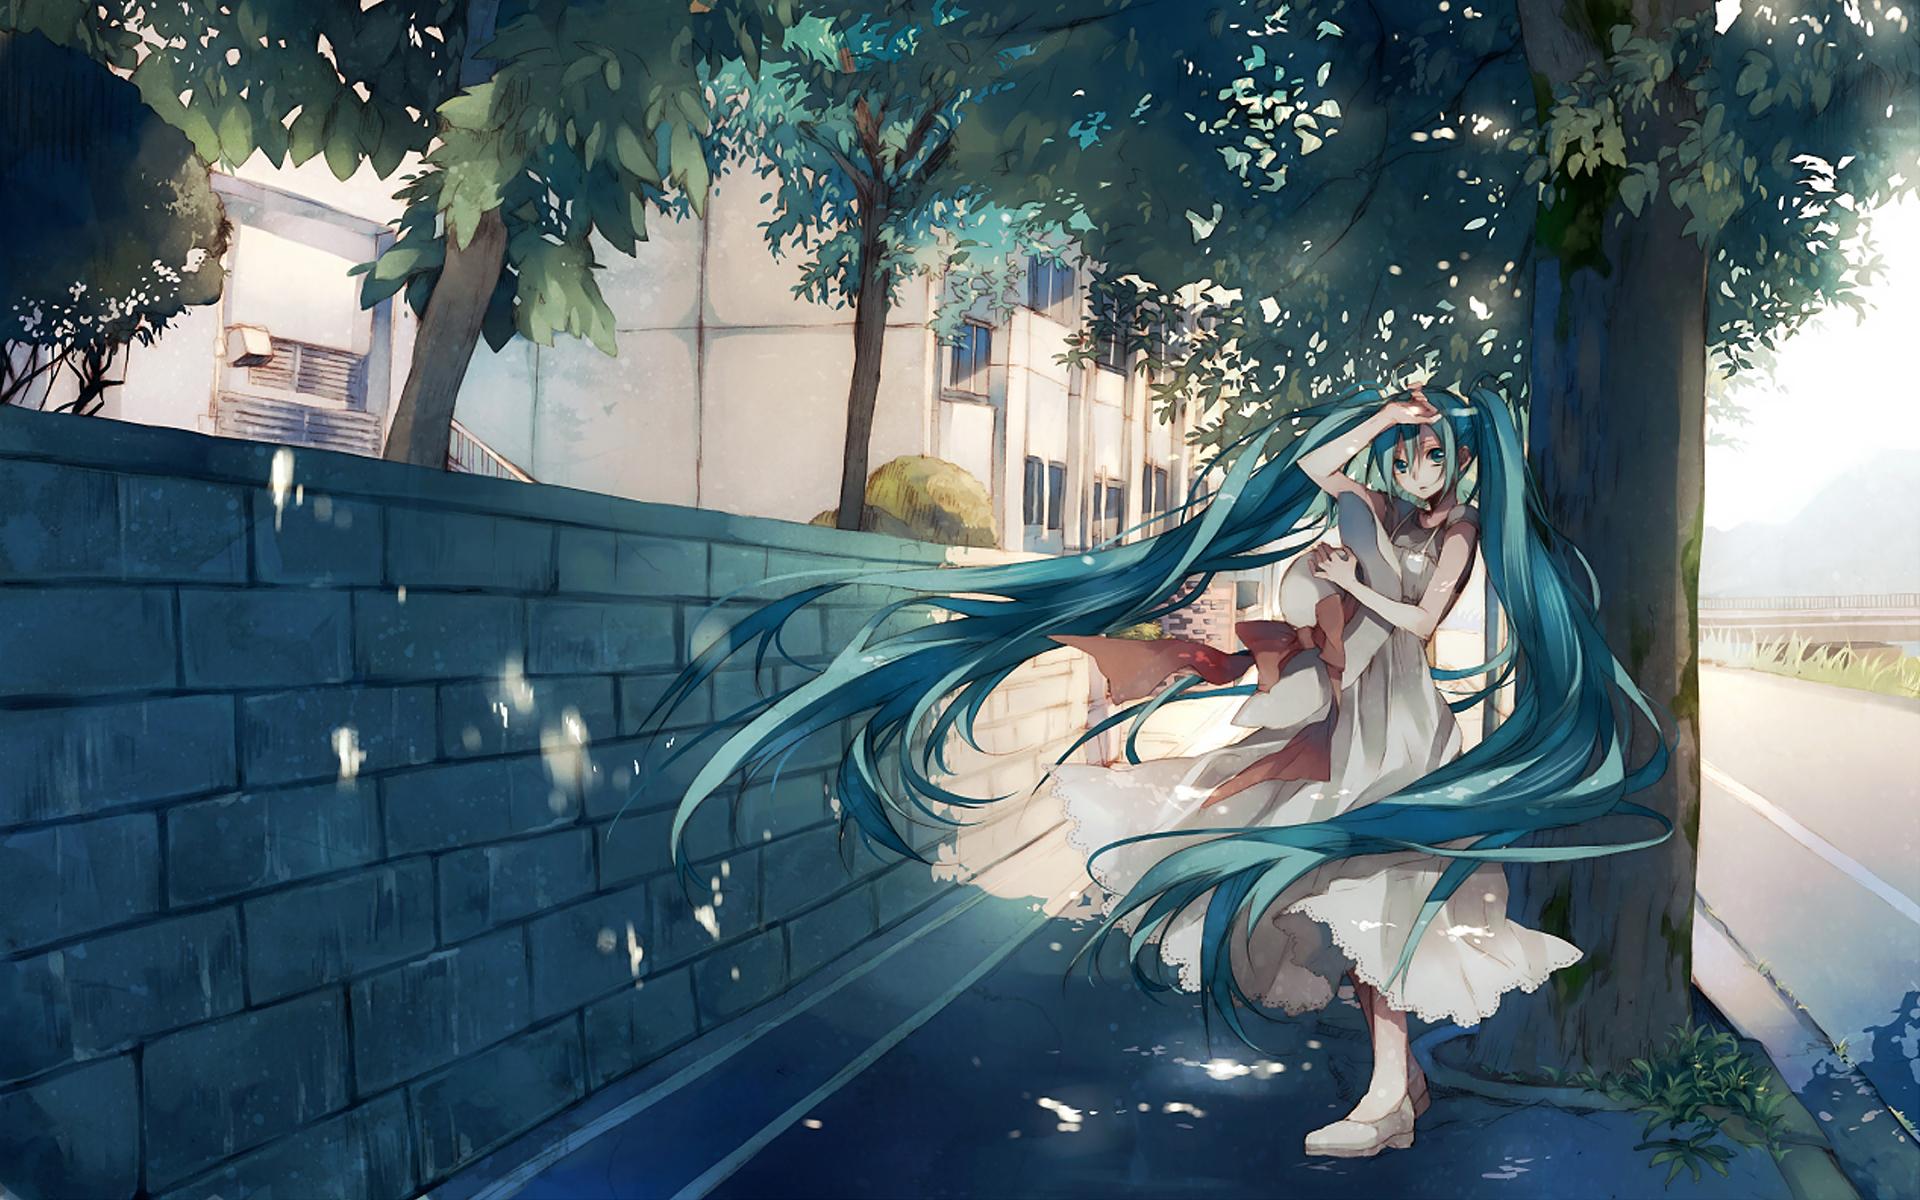 Sad Girl Hd Wallpaper Free Download Desktop Hatsune Miku Hd Wallpapers Pixelstalk Net